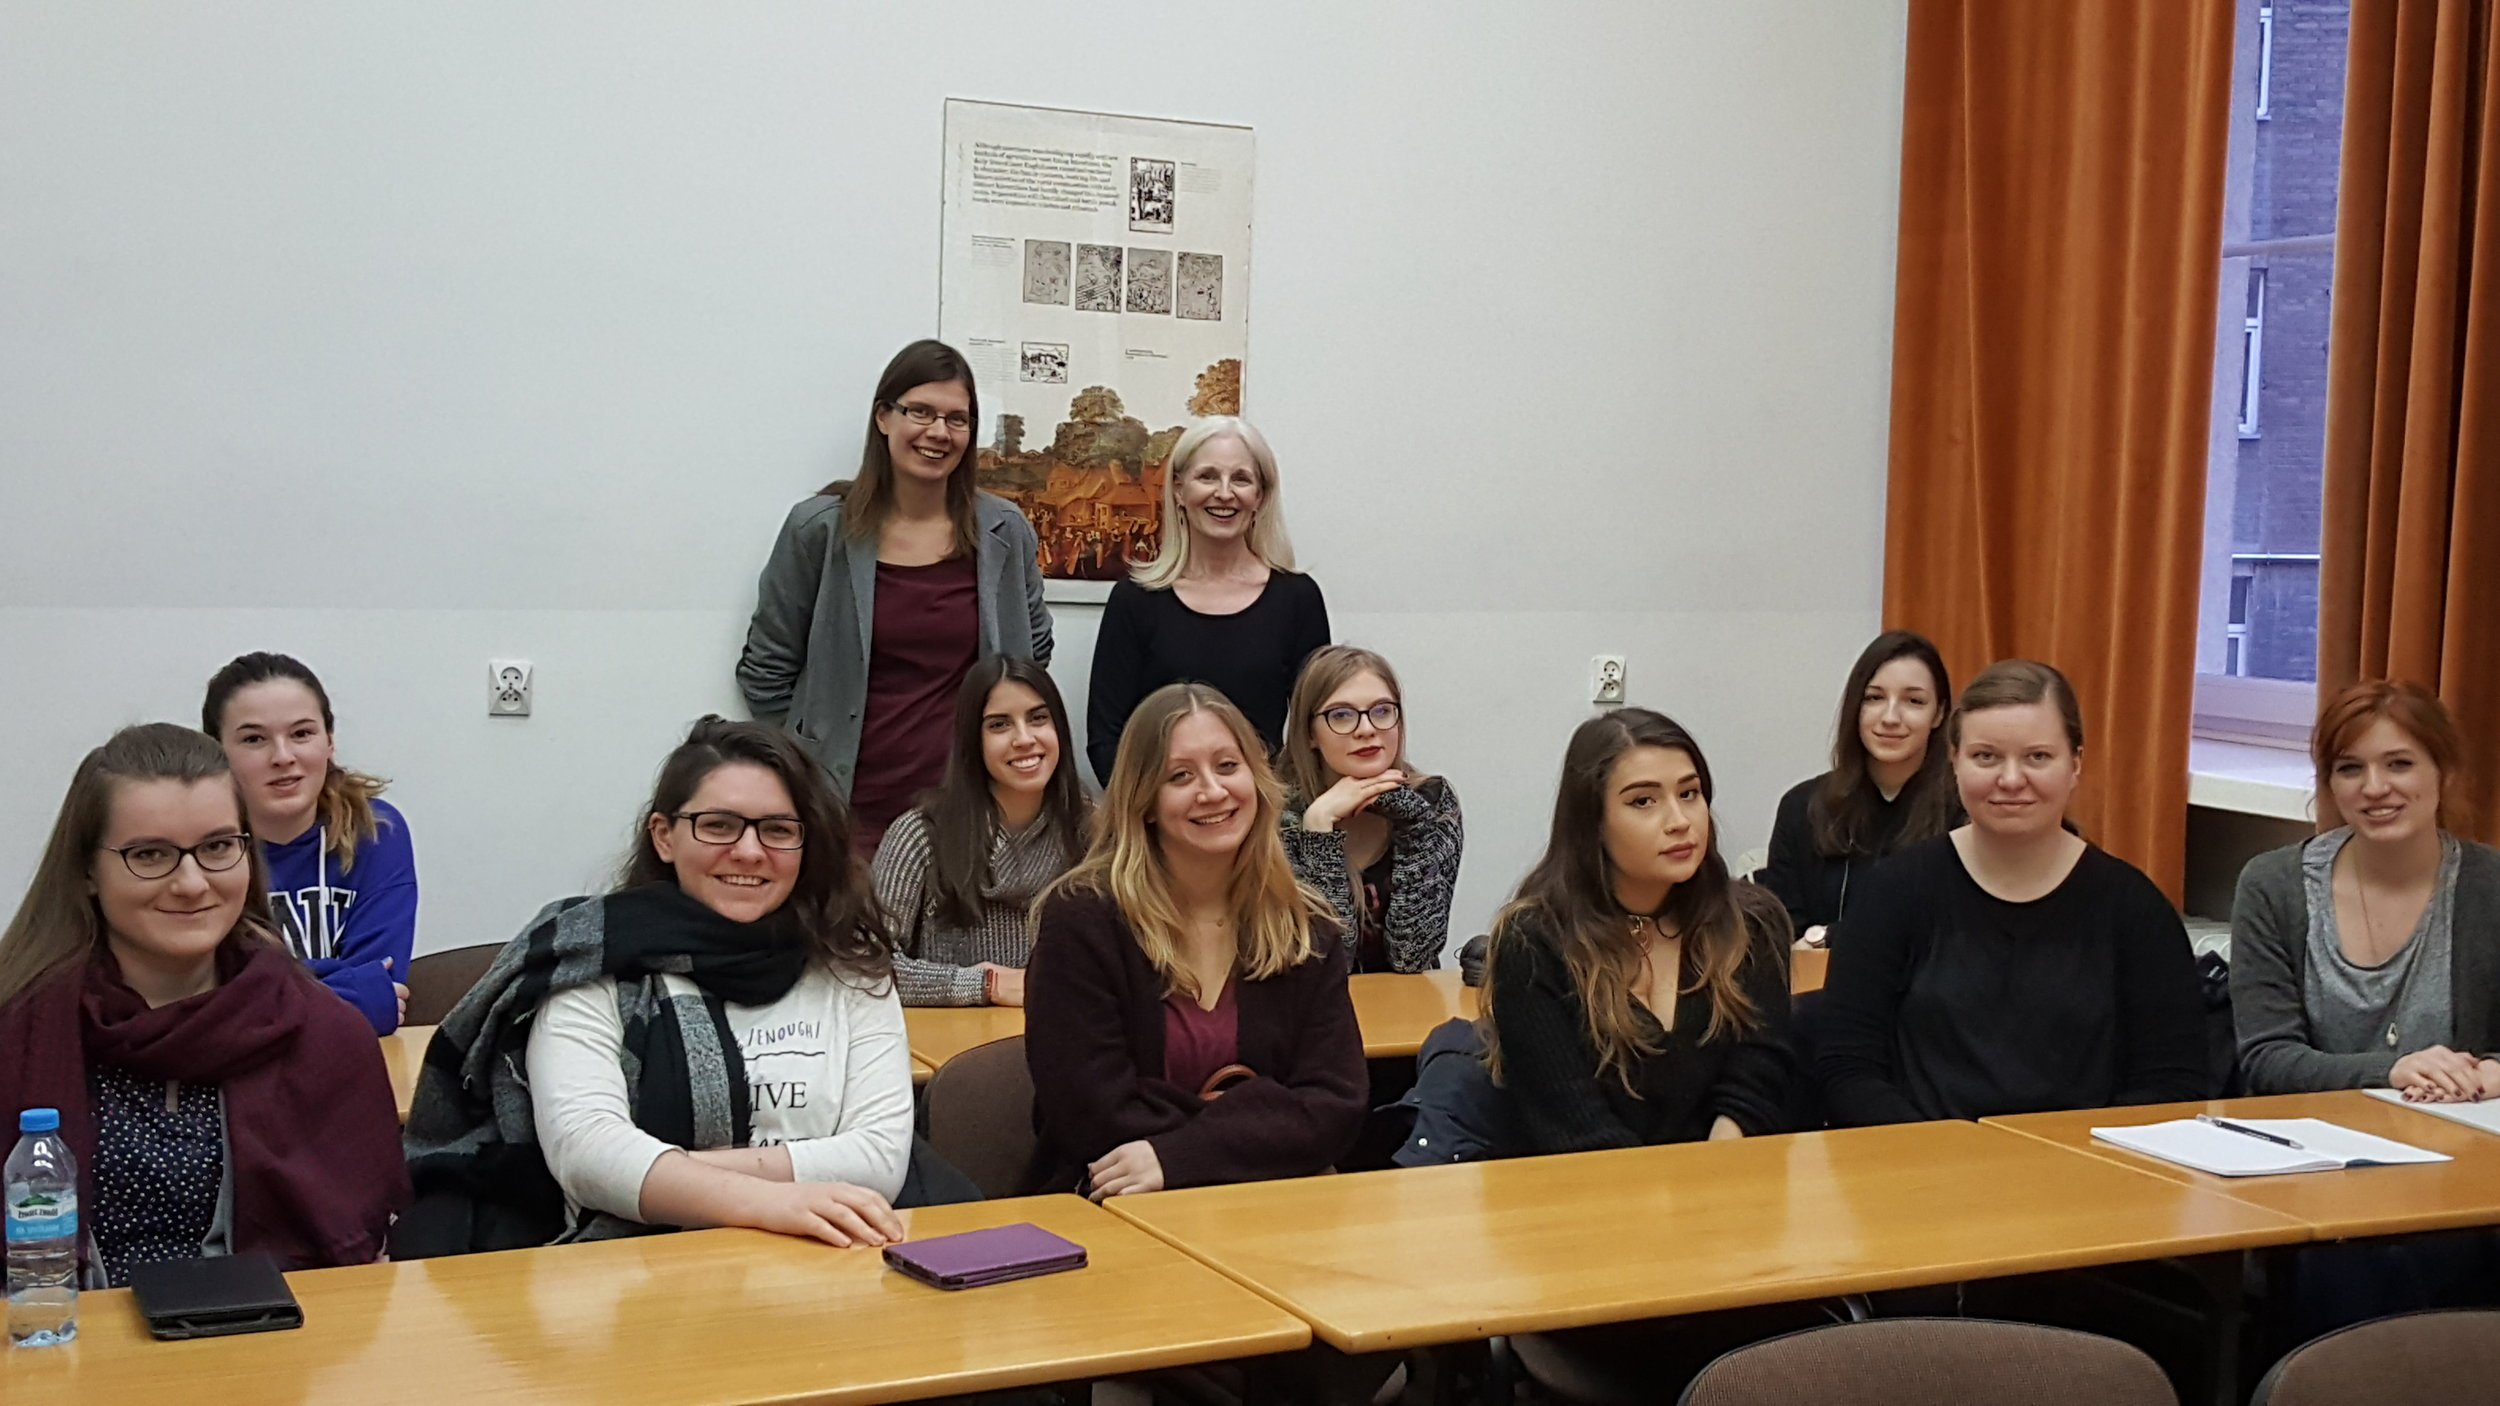 University of Warsaw English Students, with Professor Justin Wlodarczyk, January 9, 2018